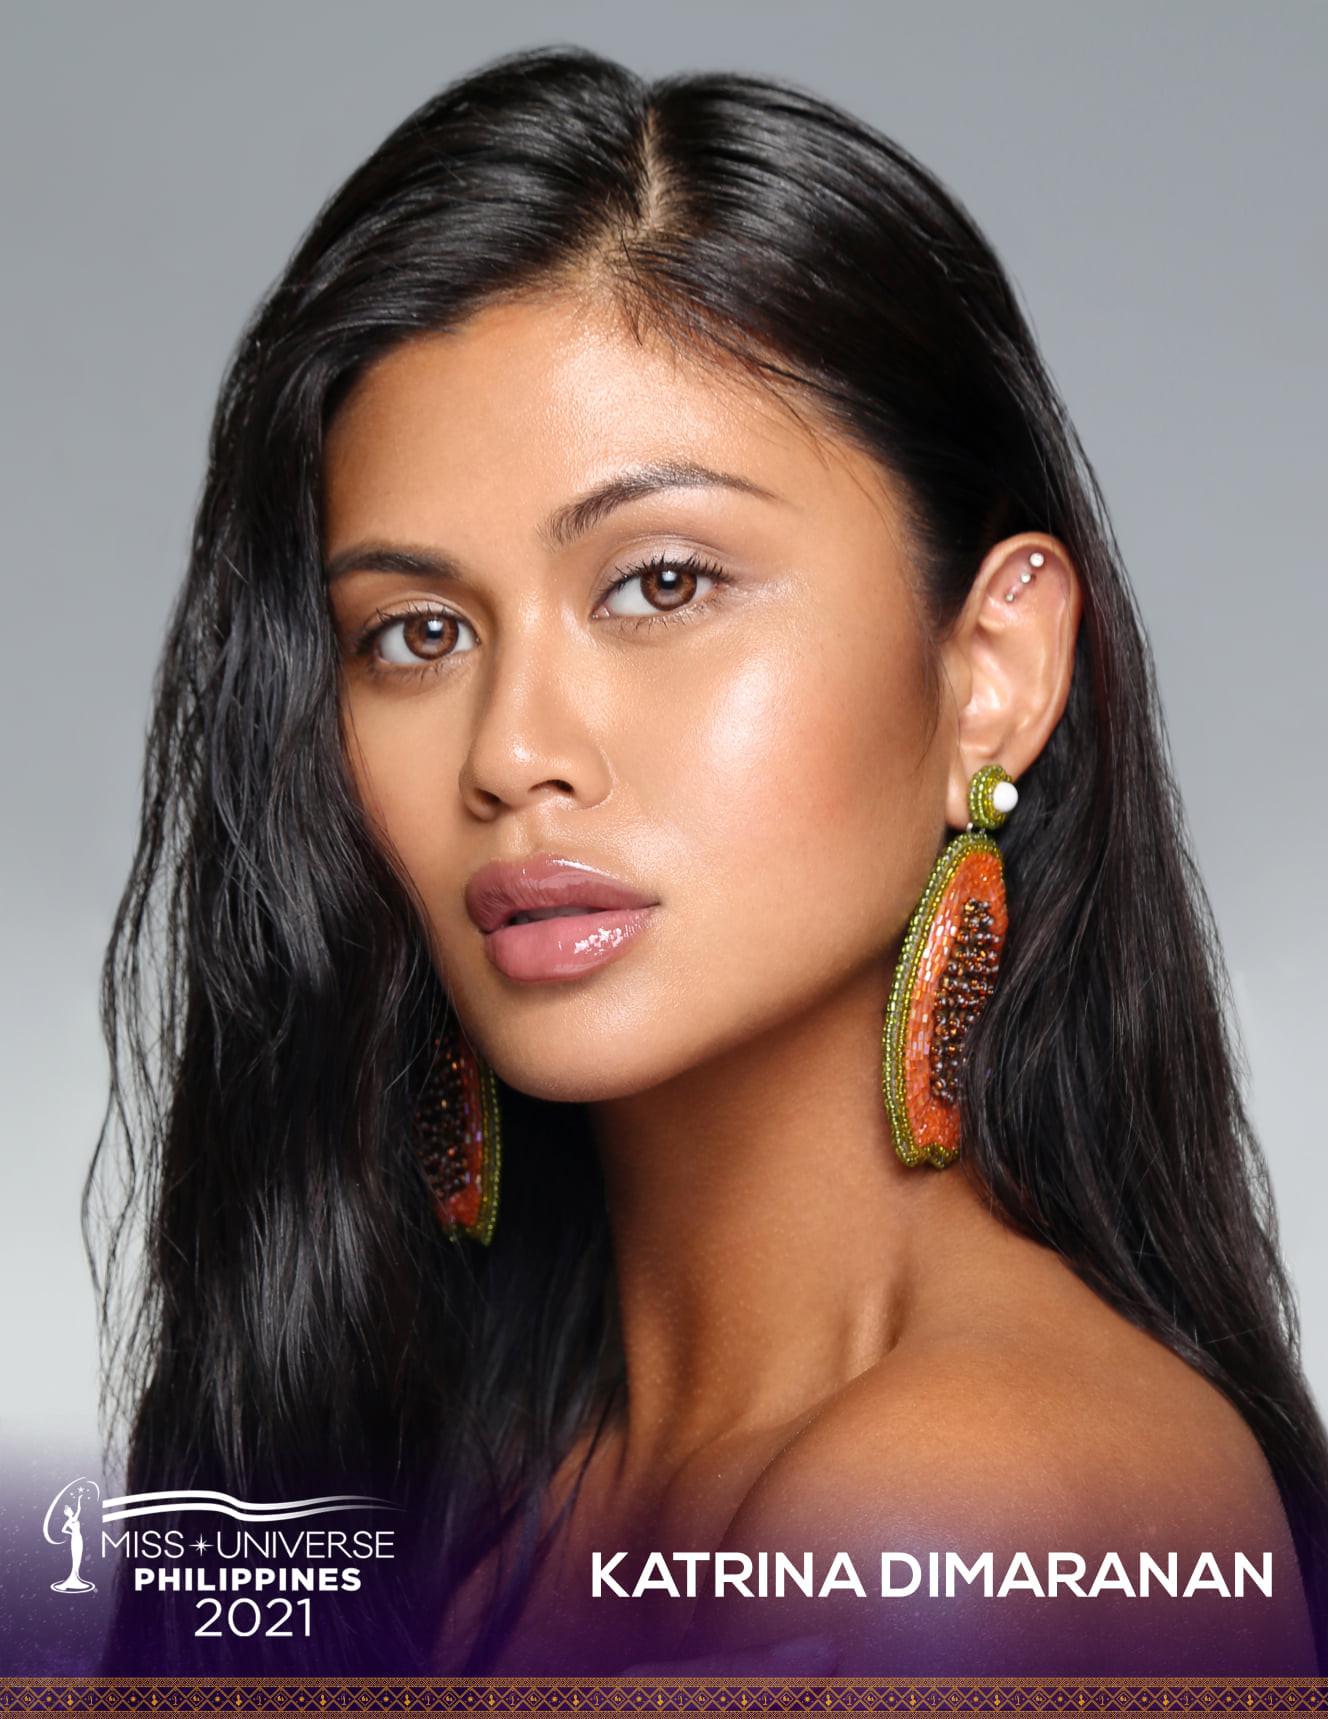 pre-candidatas a miss universe philippines 2021. - Página 4 AlAI0g